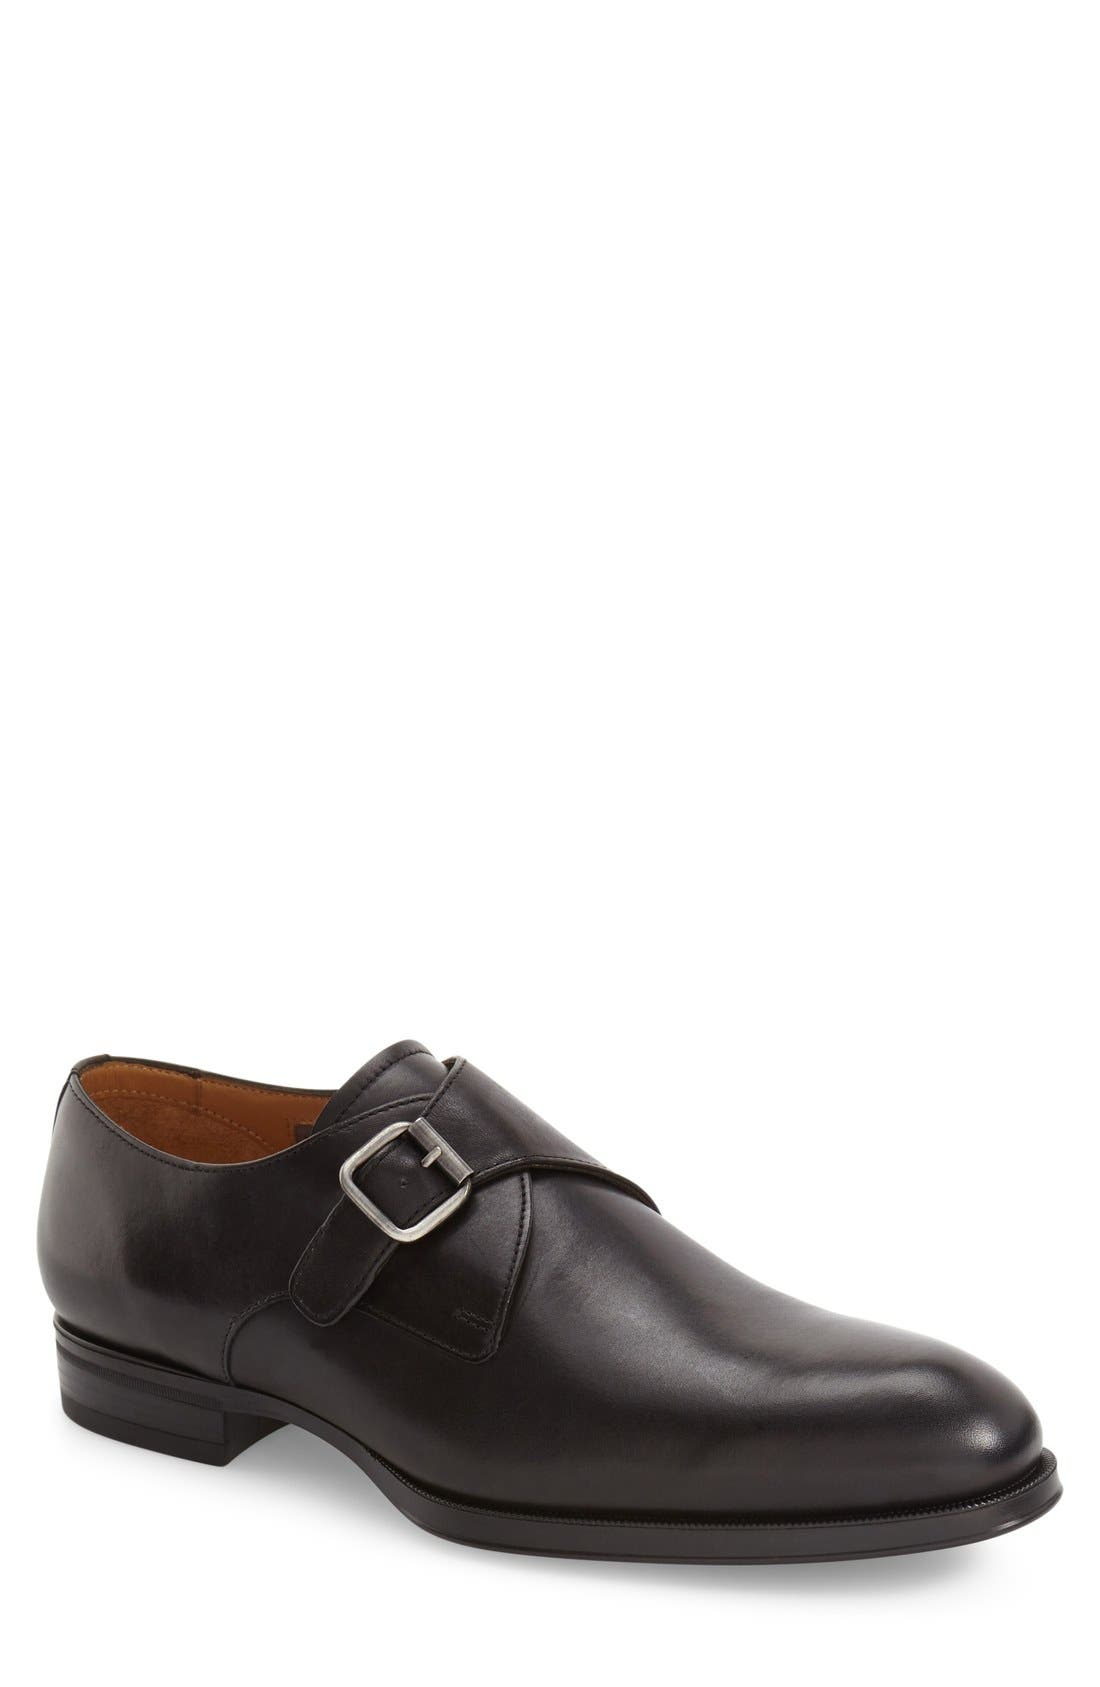 'Trifolo' Monk Strap Shoe,                             Main thumbnail 1, color,                             Black Leather